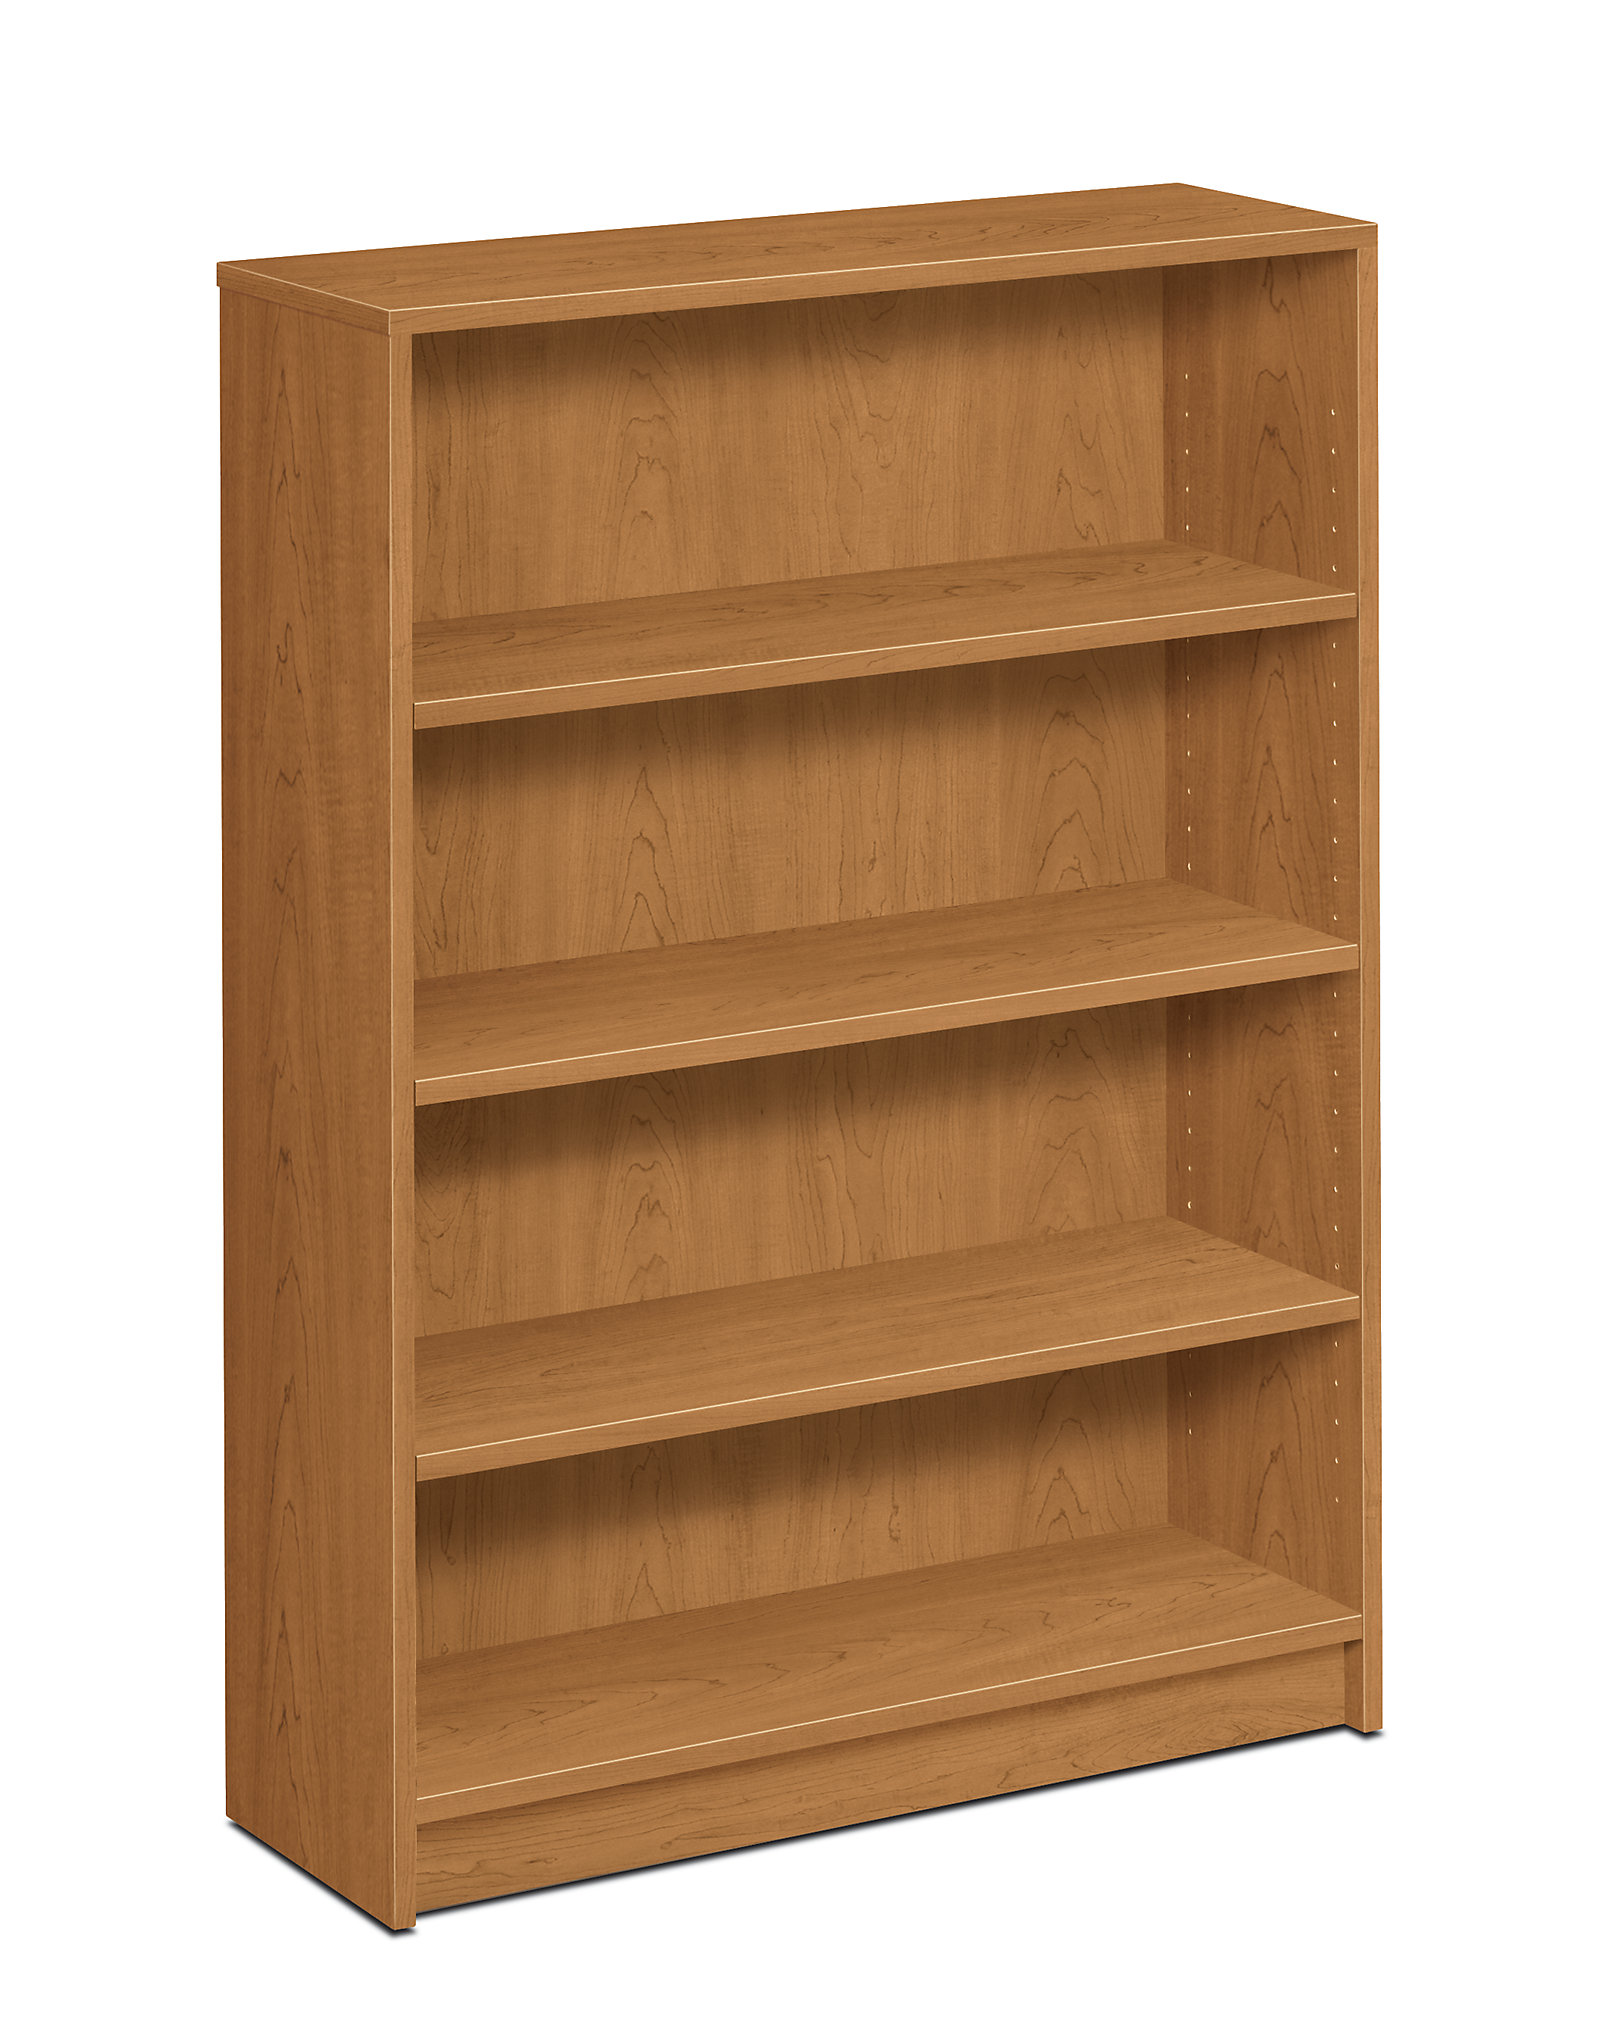 brigade bookcase images bookshelf hon bookshelves bookcases stainless steel